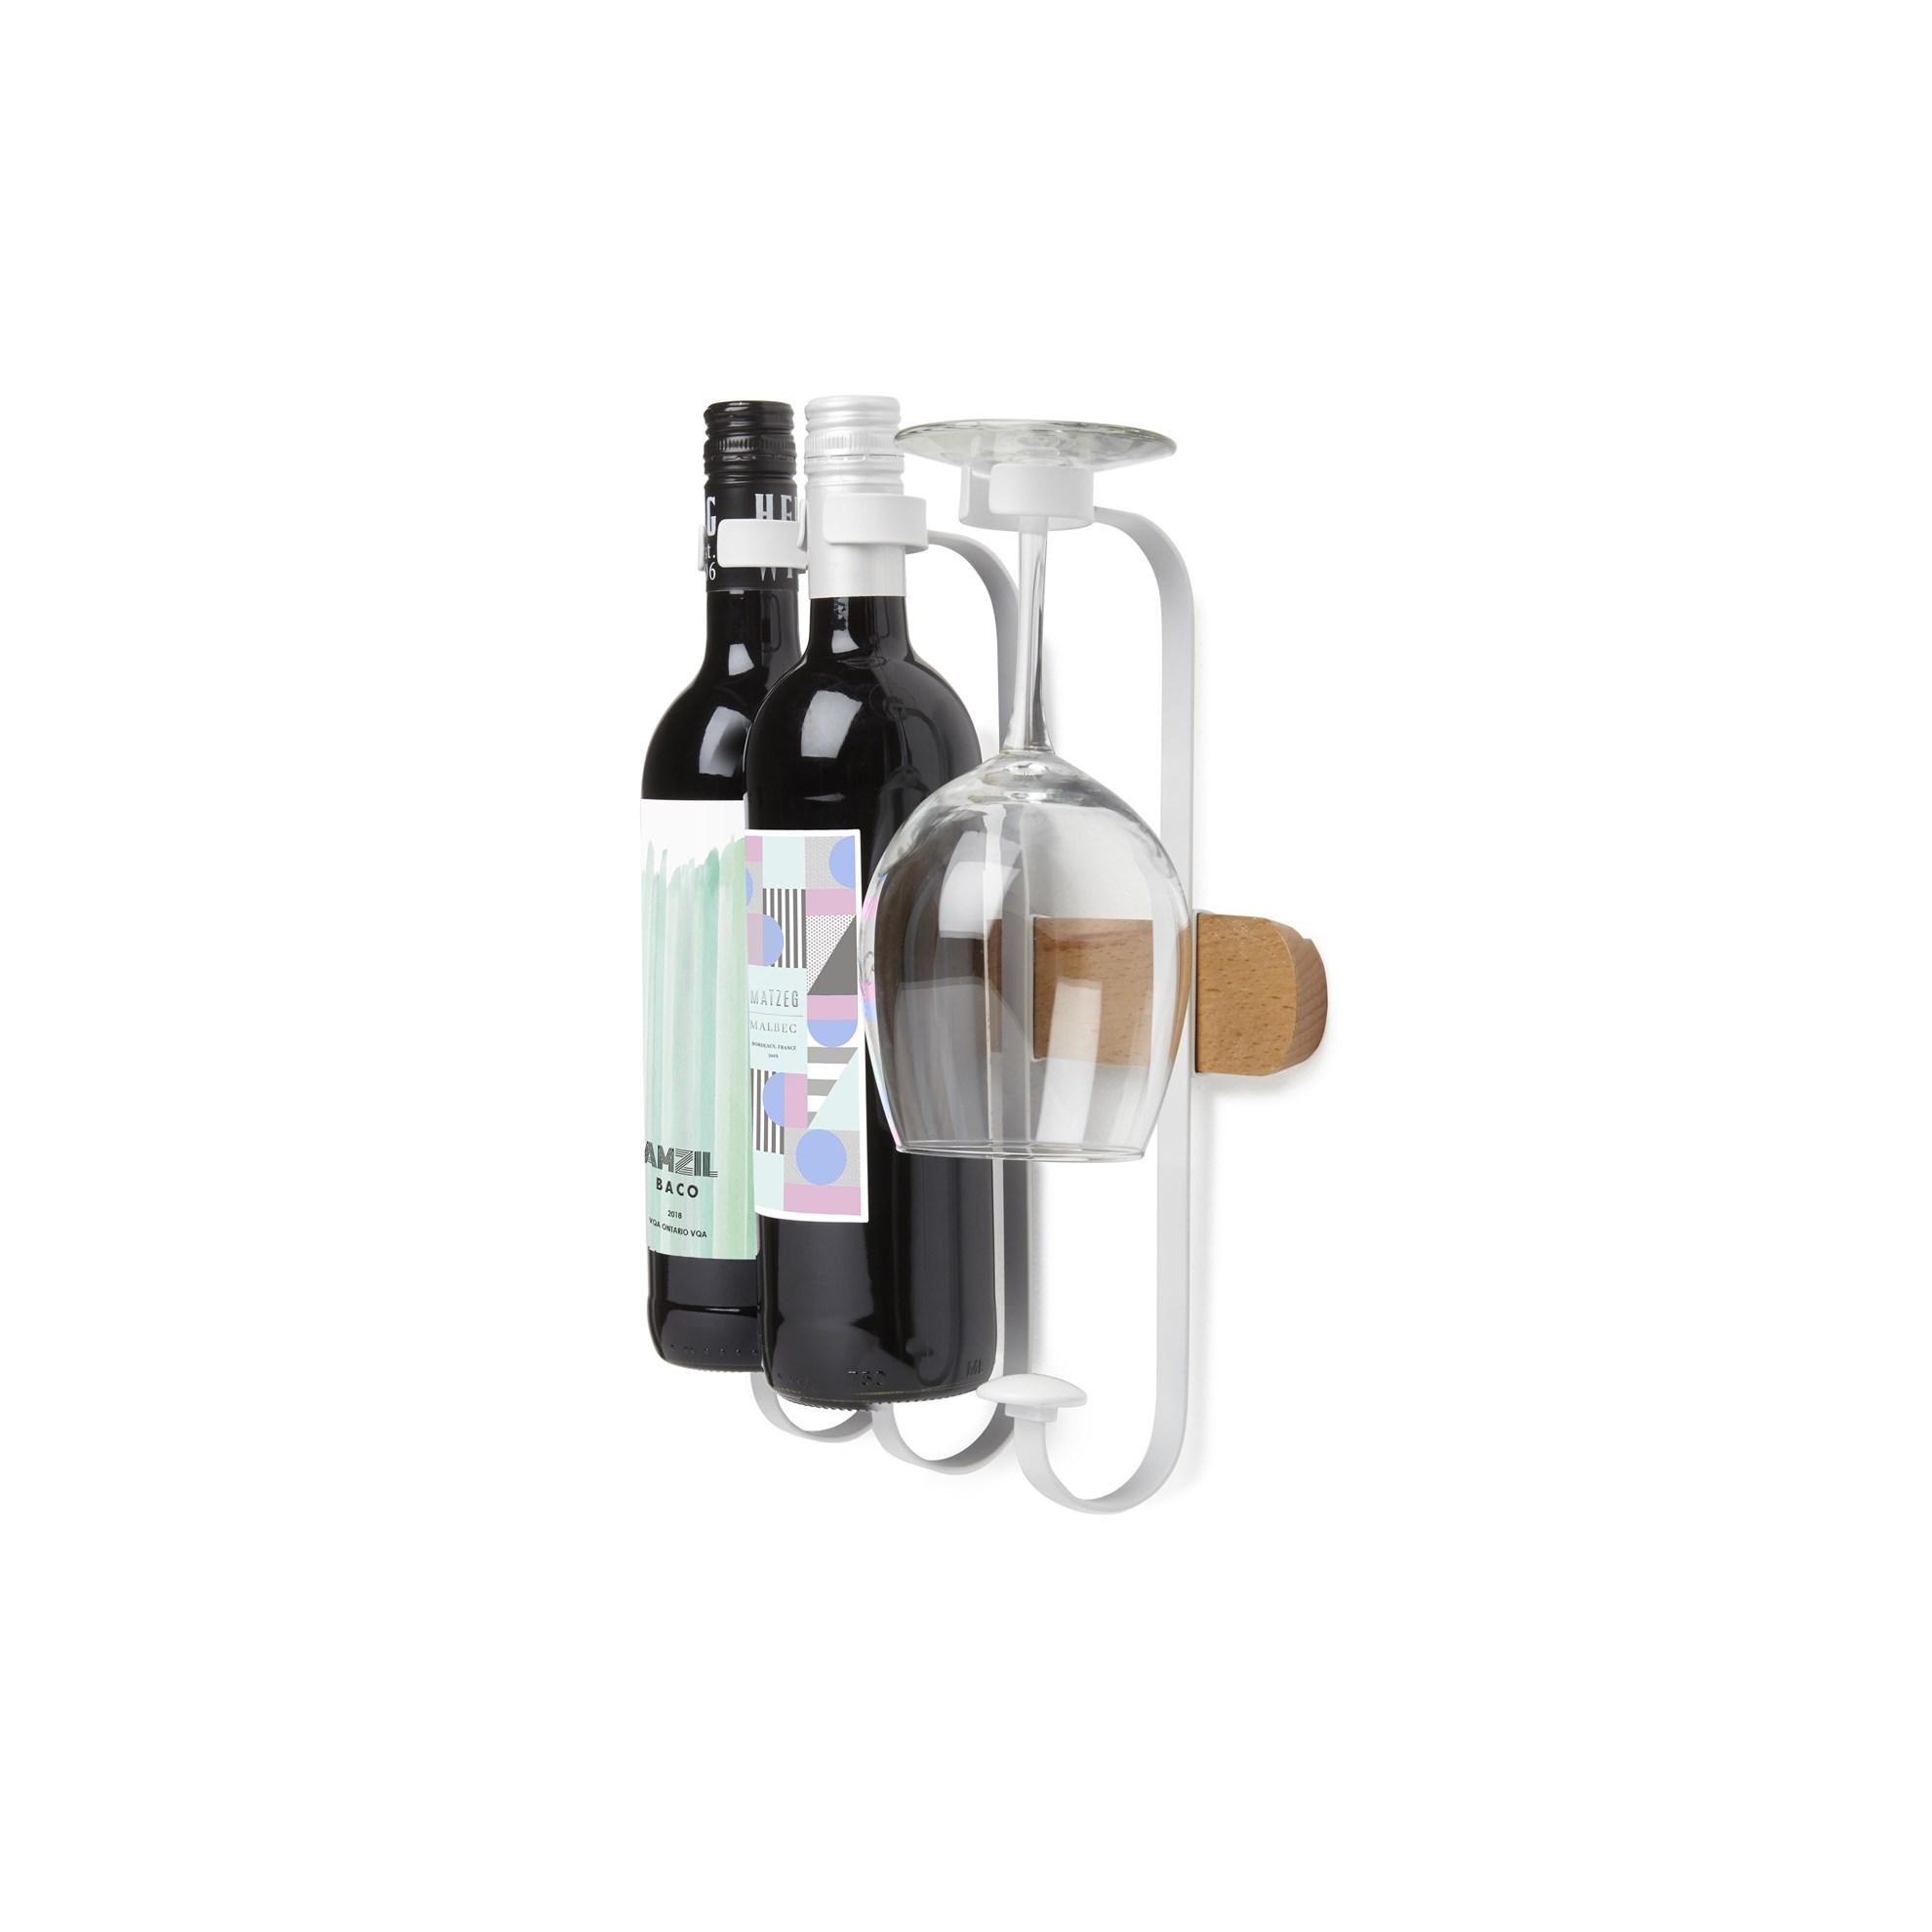 Stojan na víno SHOWVINO_2